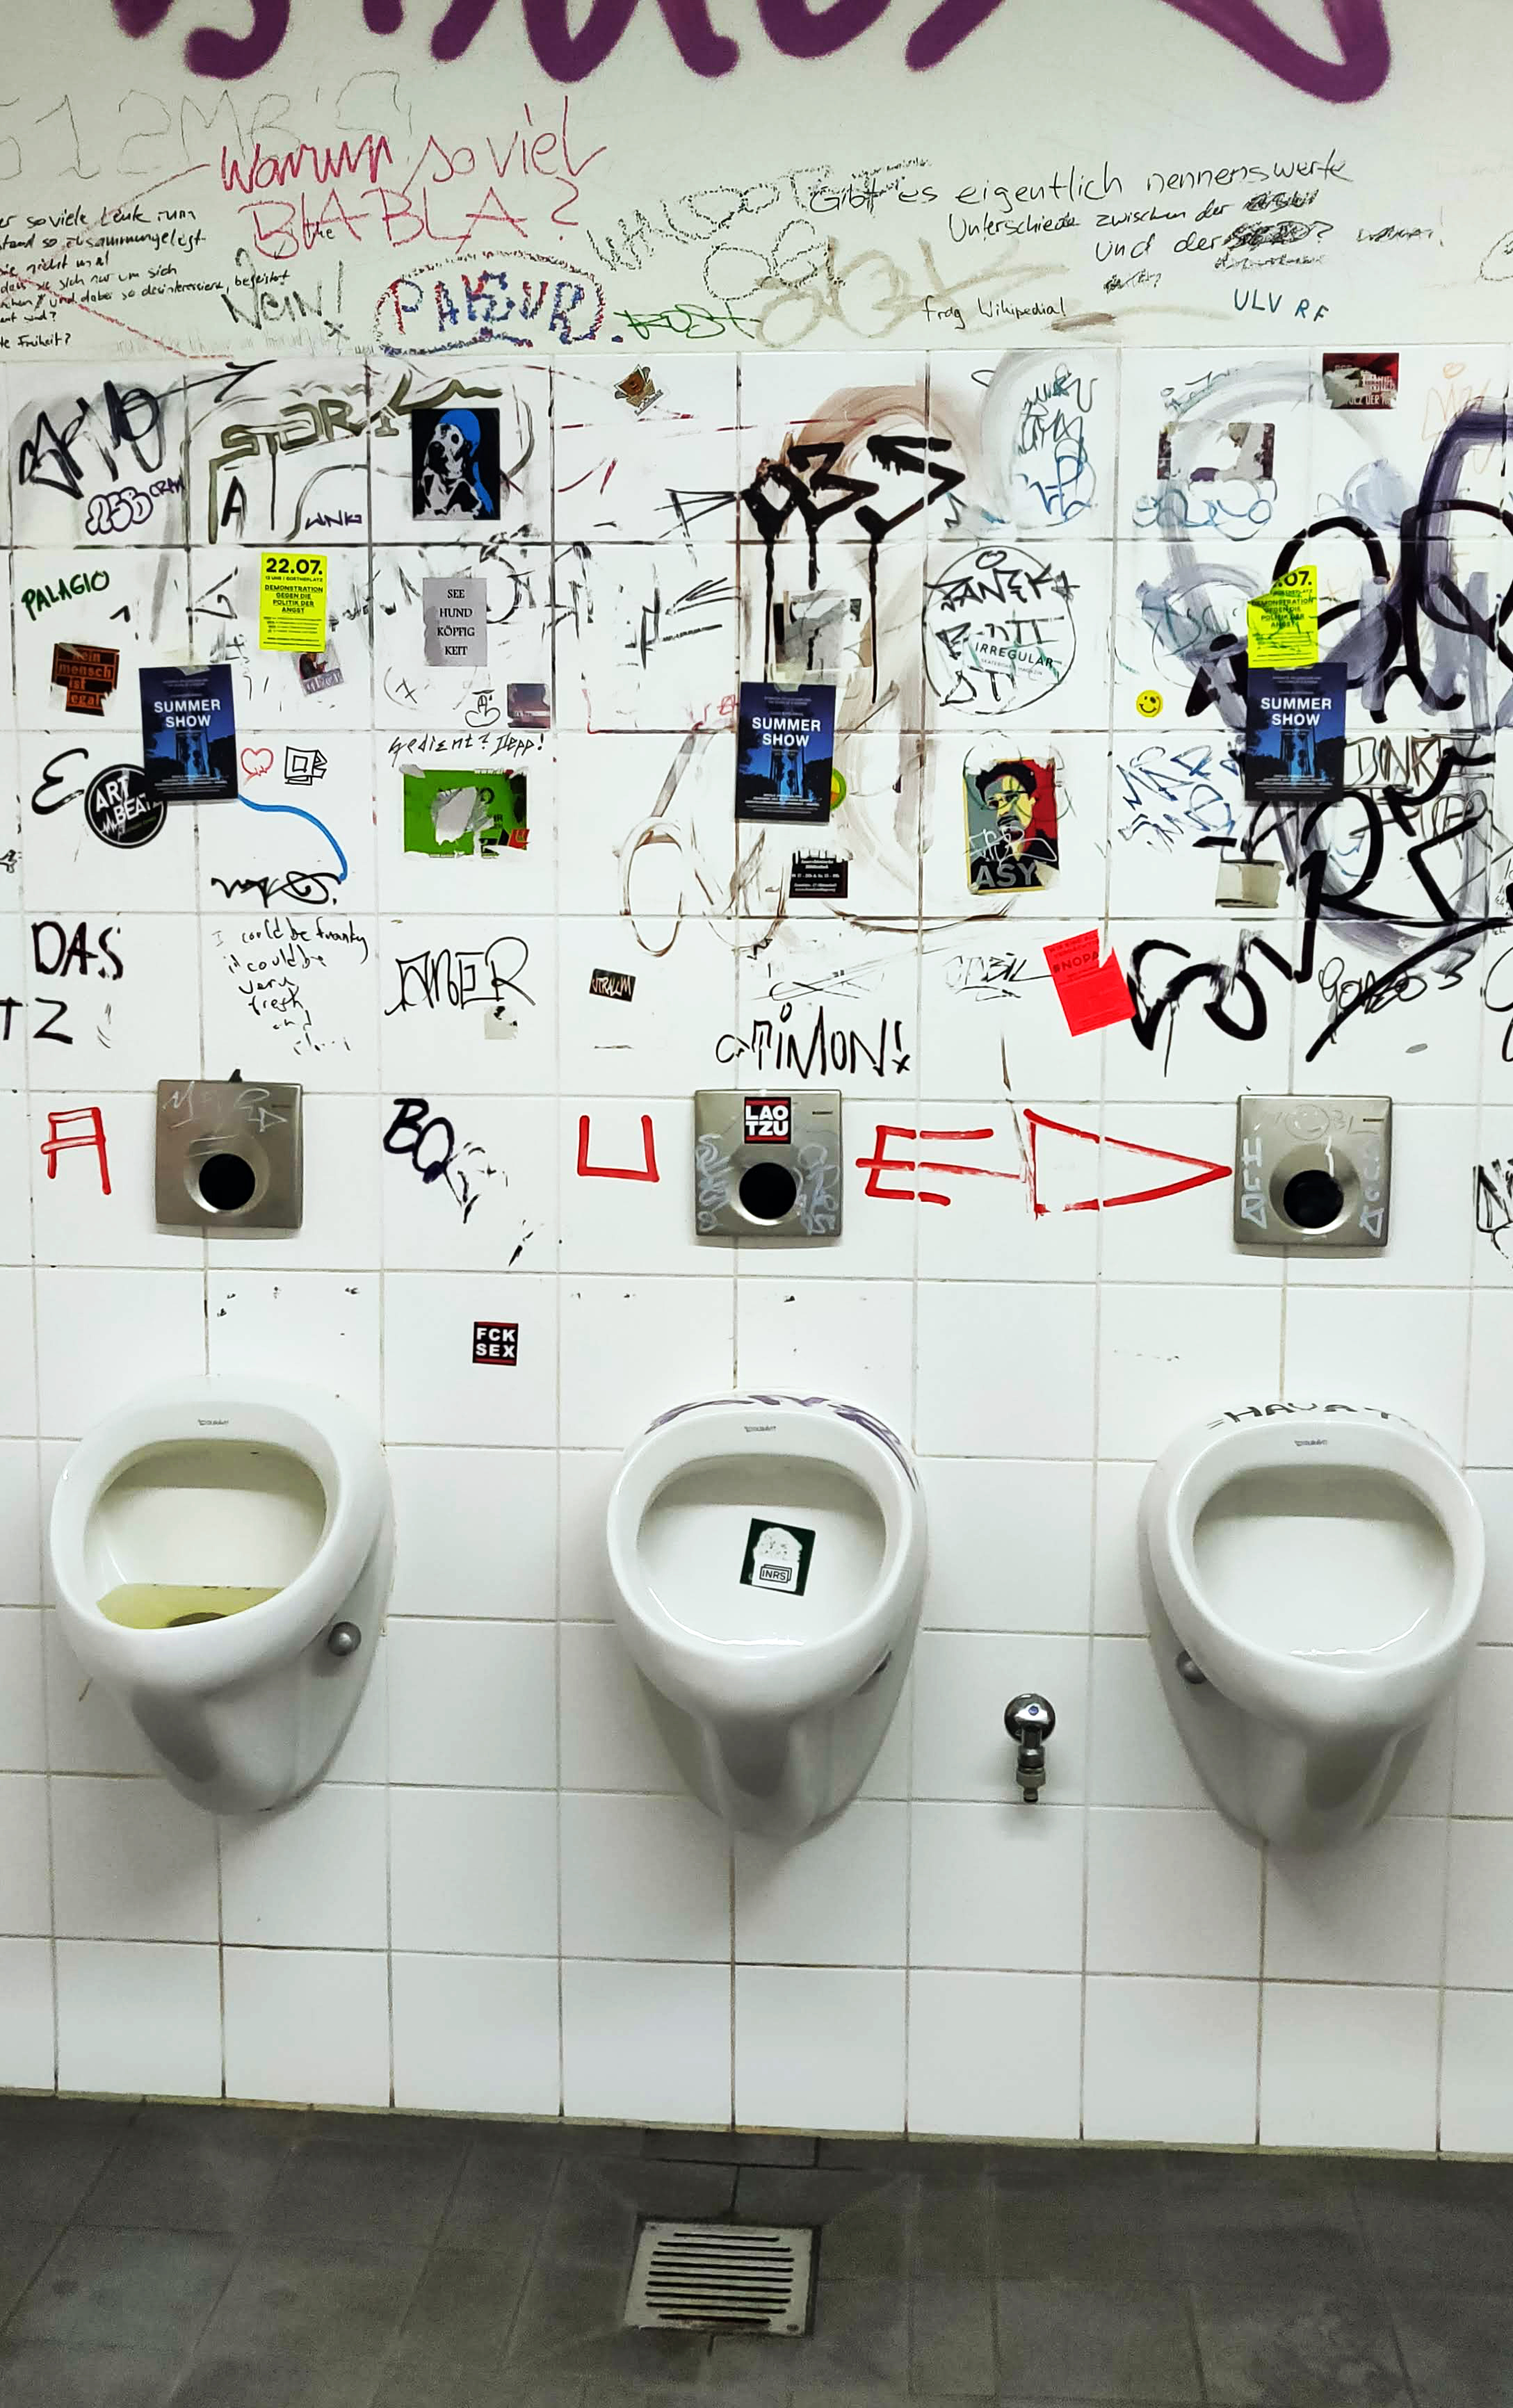 vfxjohow-toilet.jpg